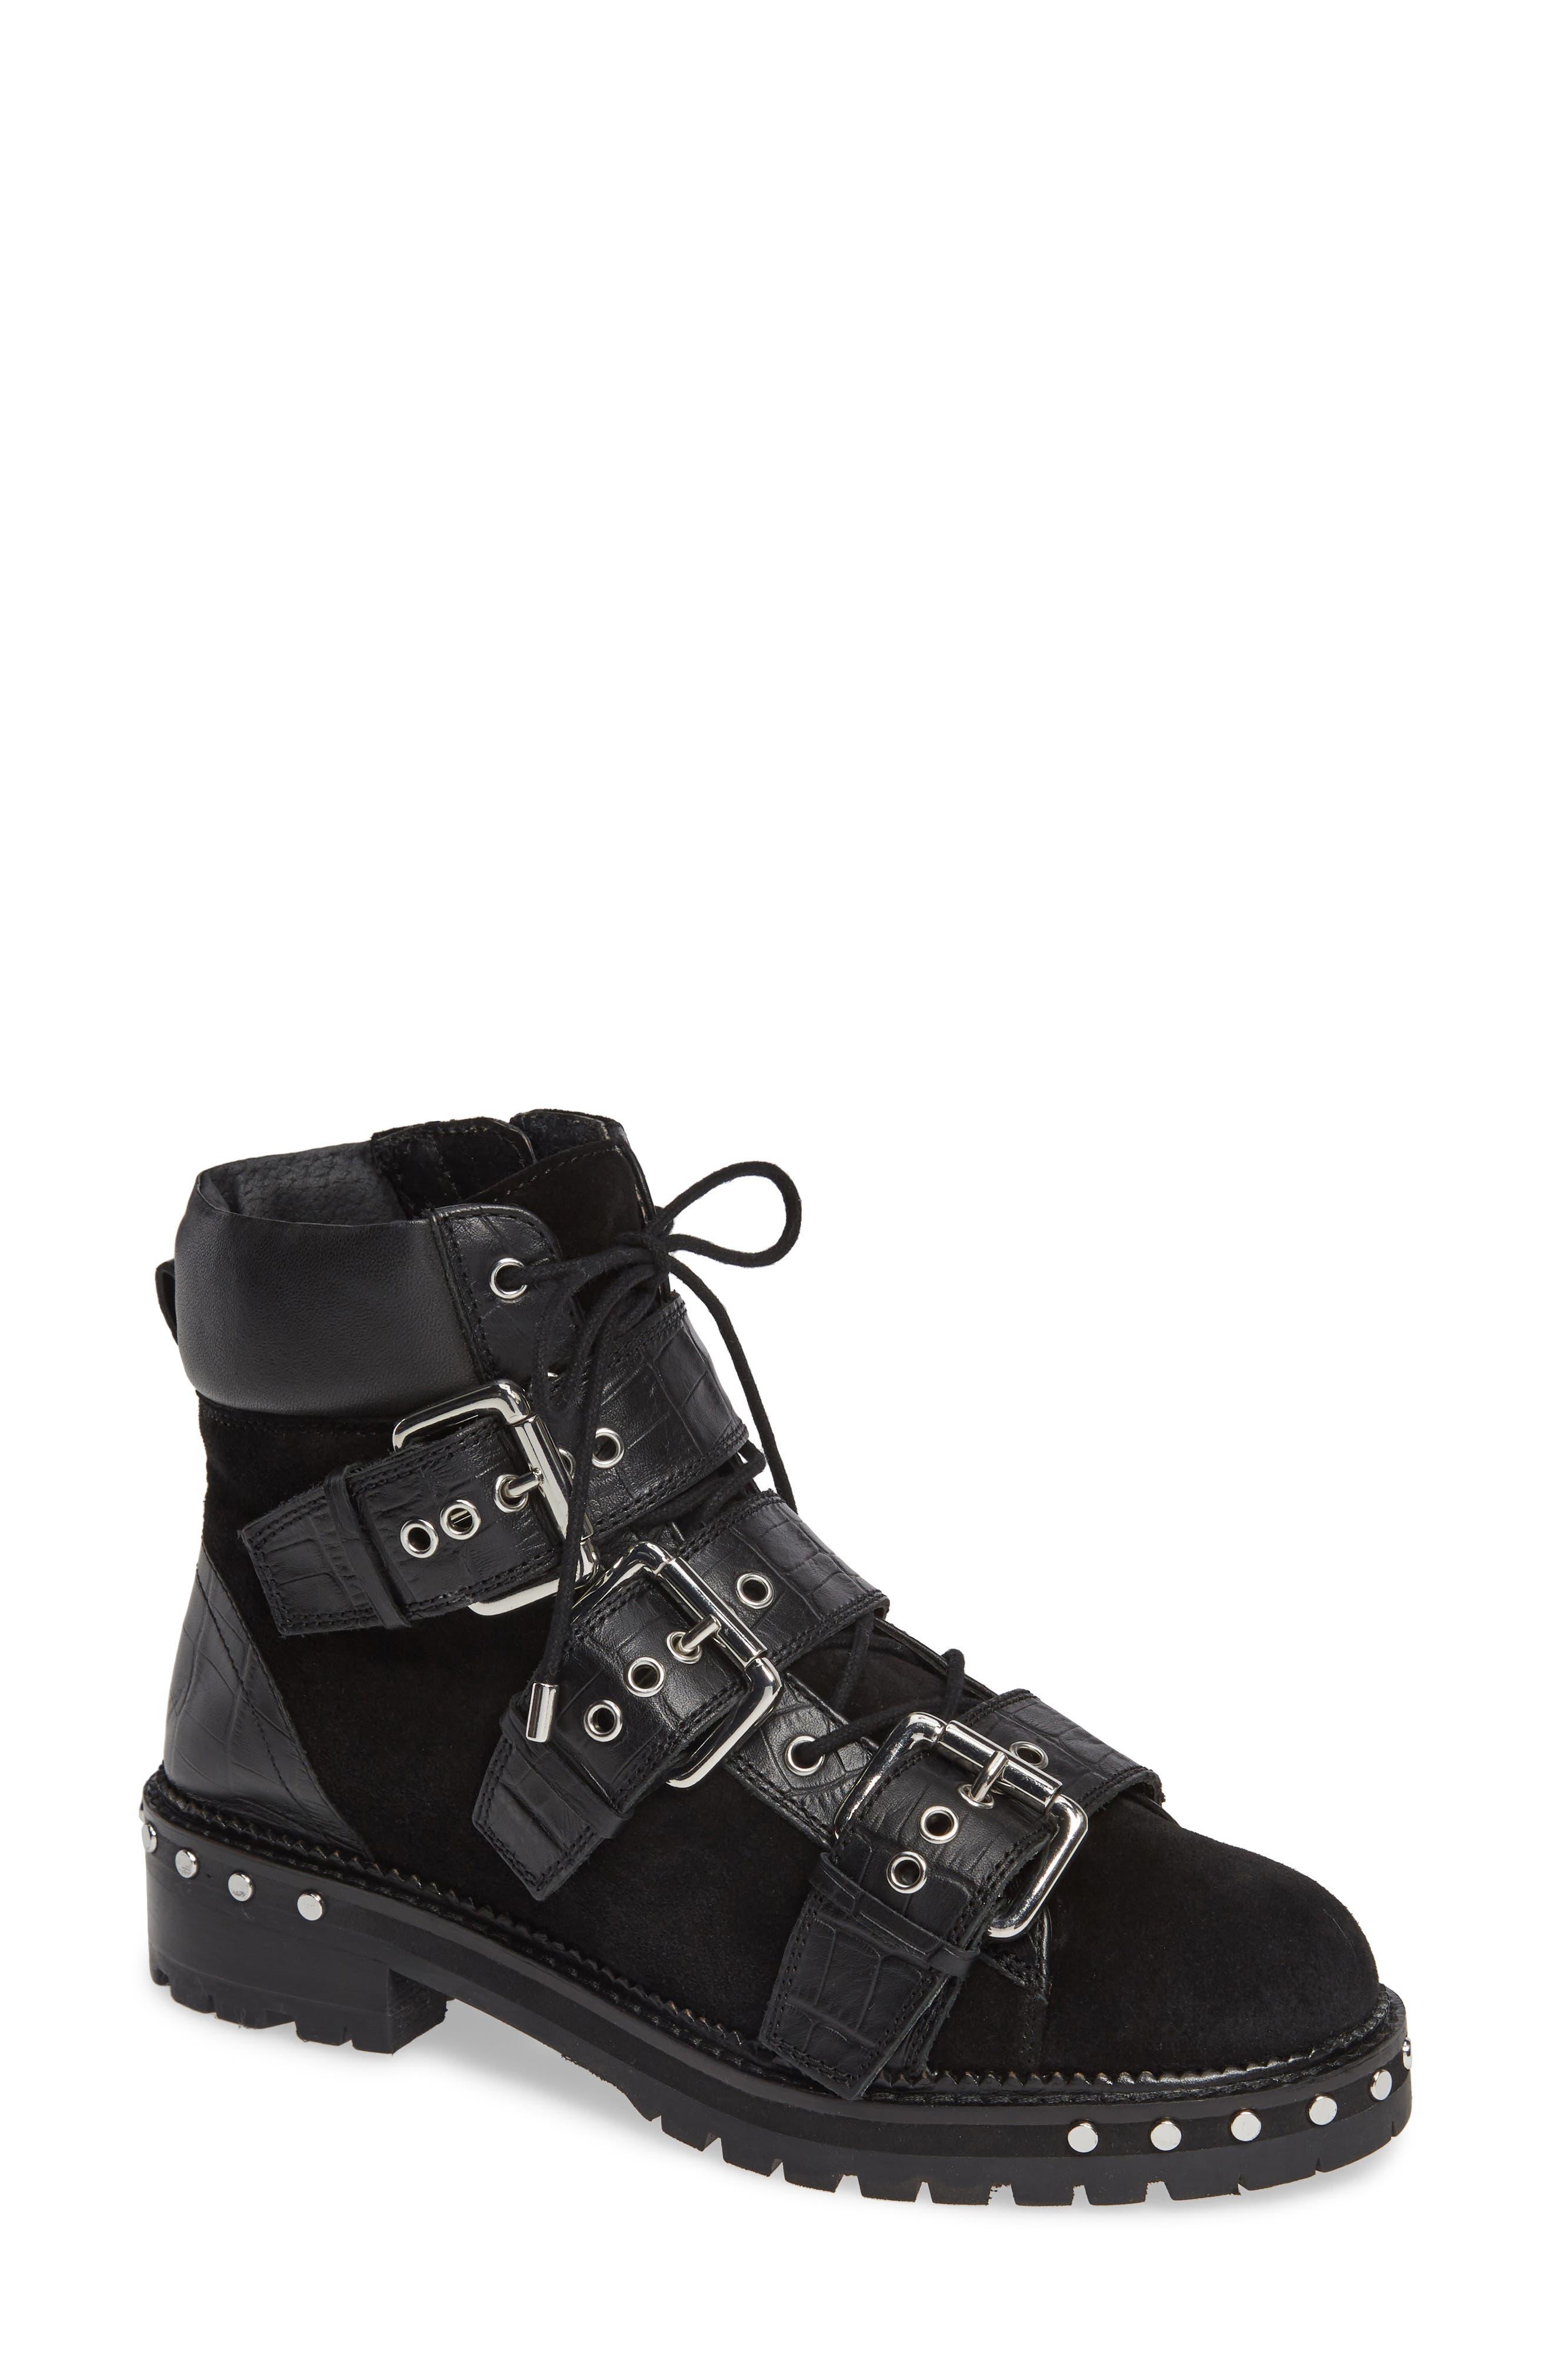 Topshop Animal Studded Boot- Black